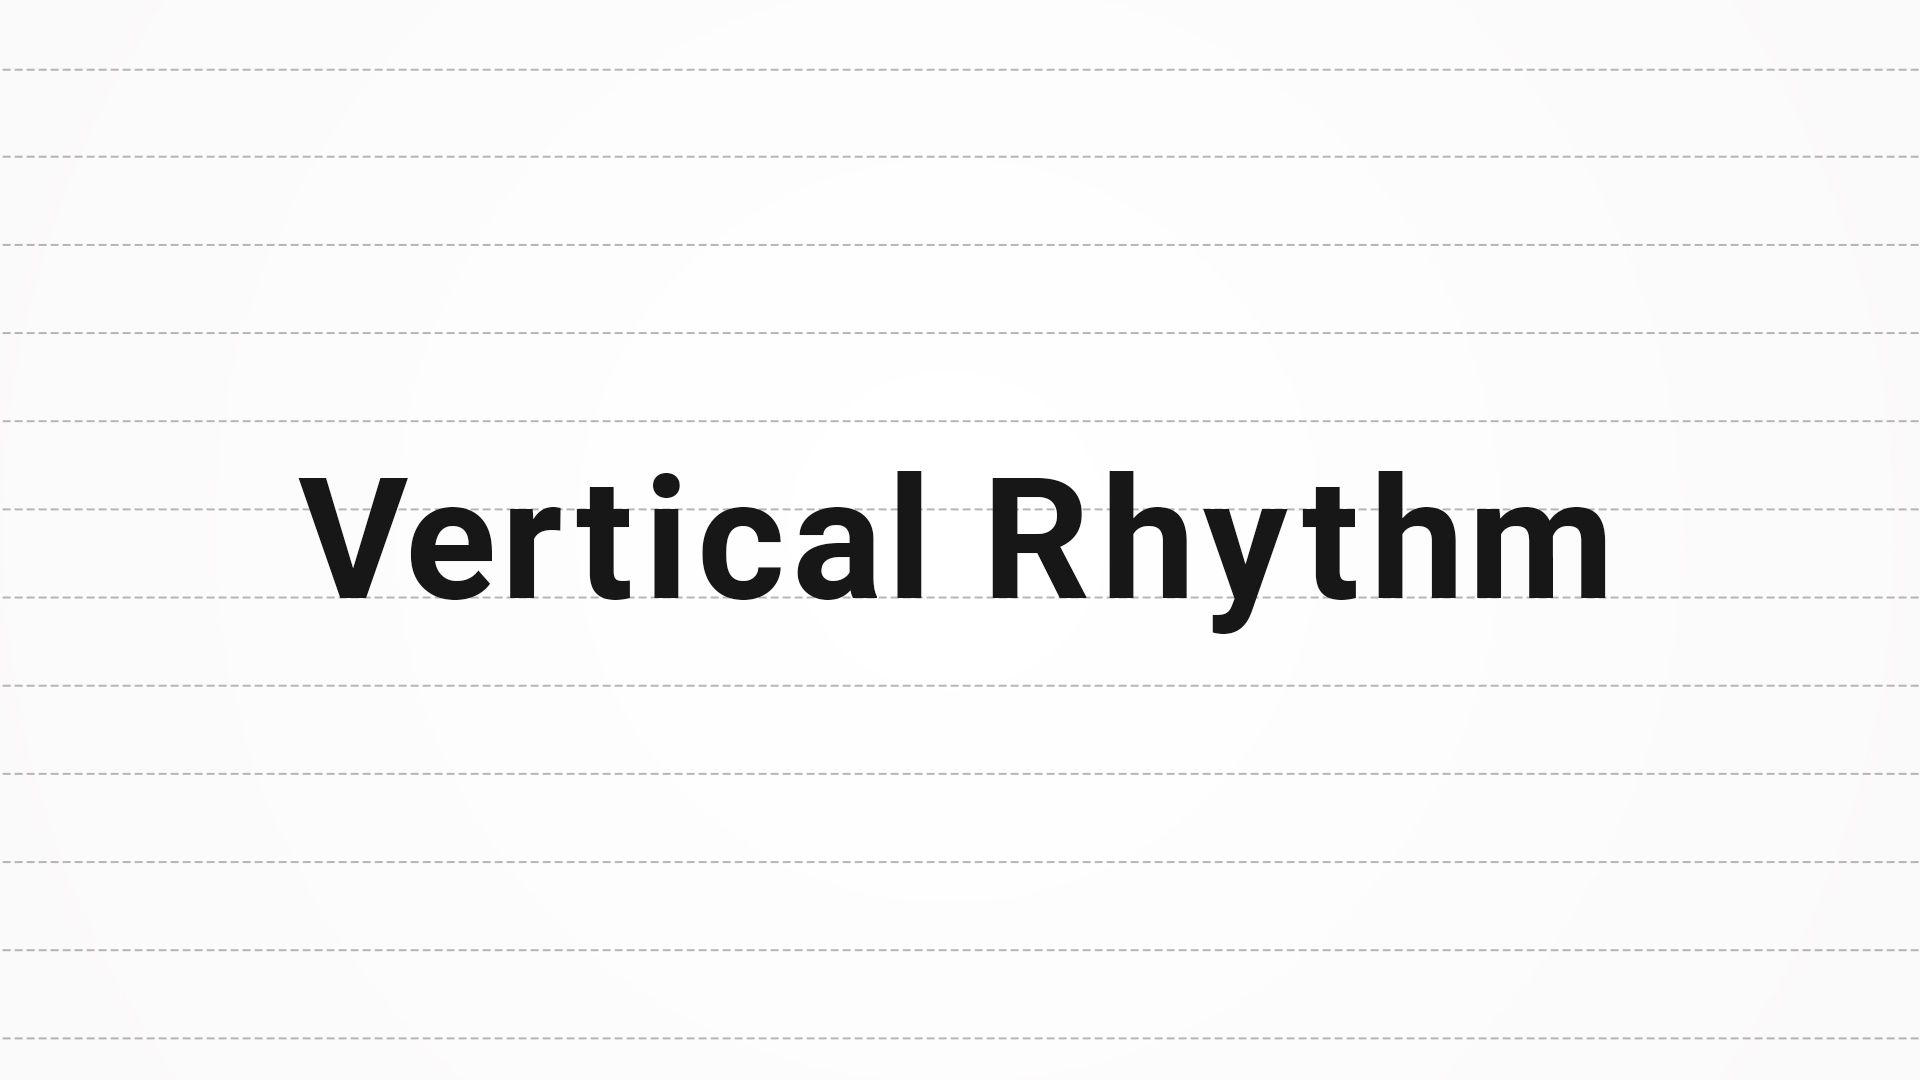 Vertical Rhythm(バーティカルリズム)と文字組の解説【WEBデザインの文字設定】